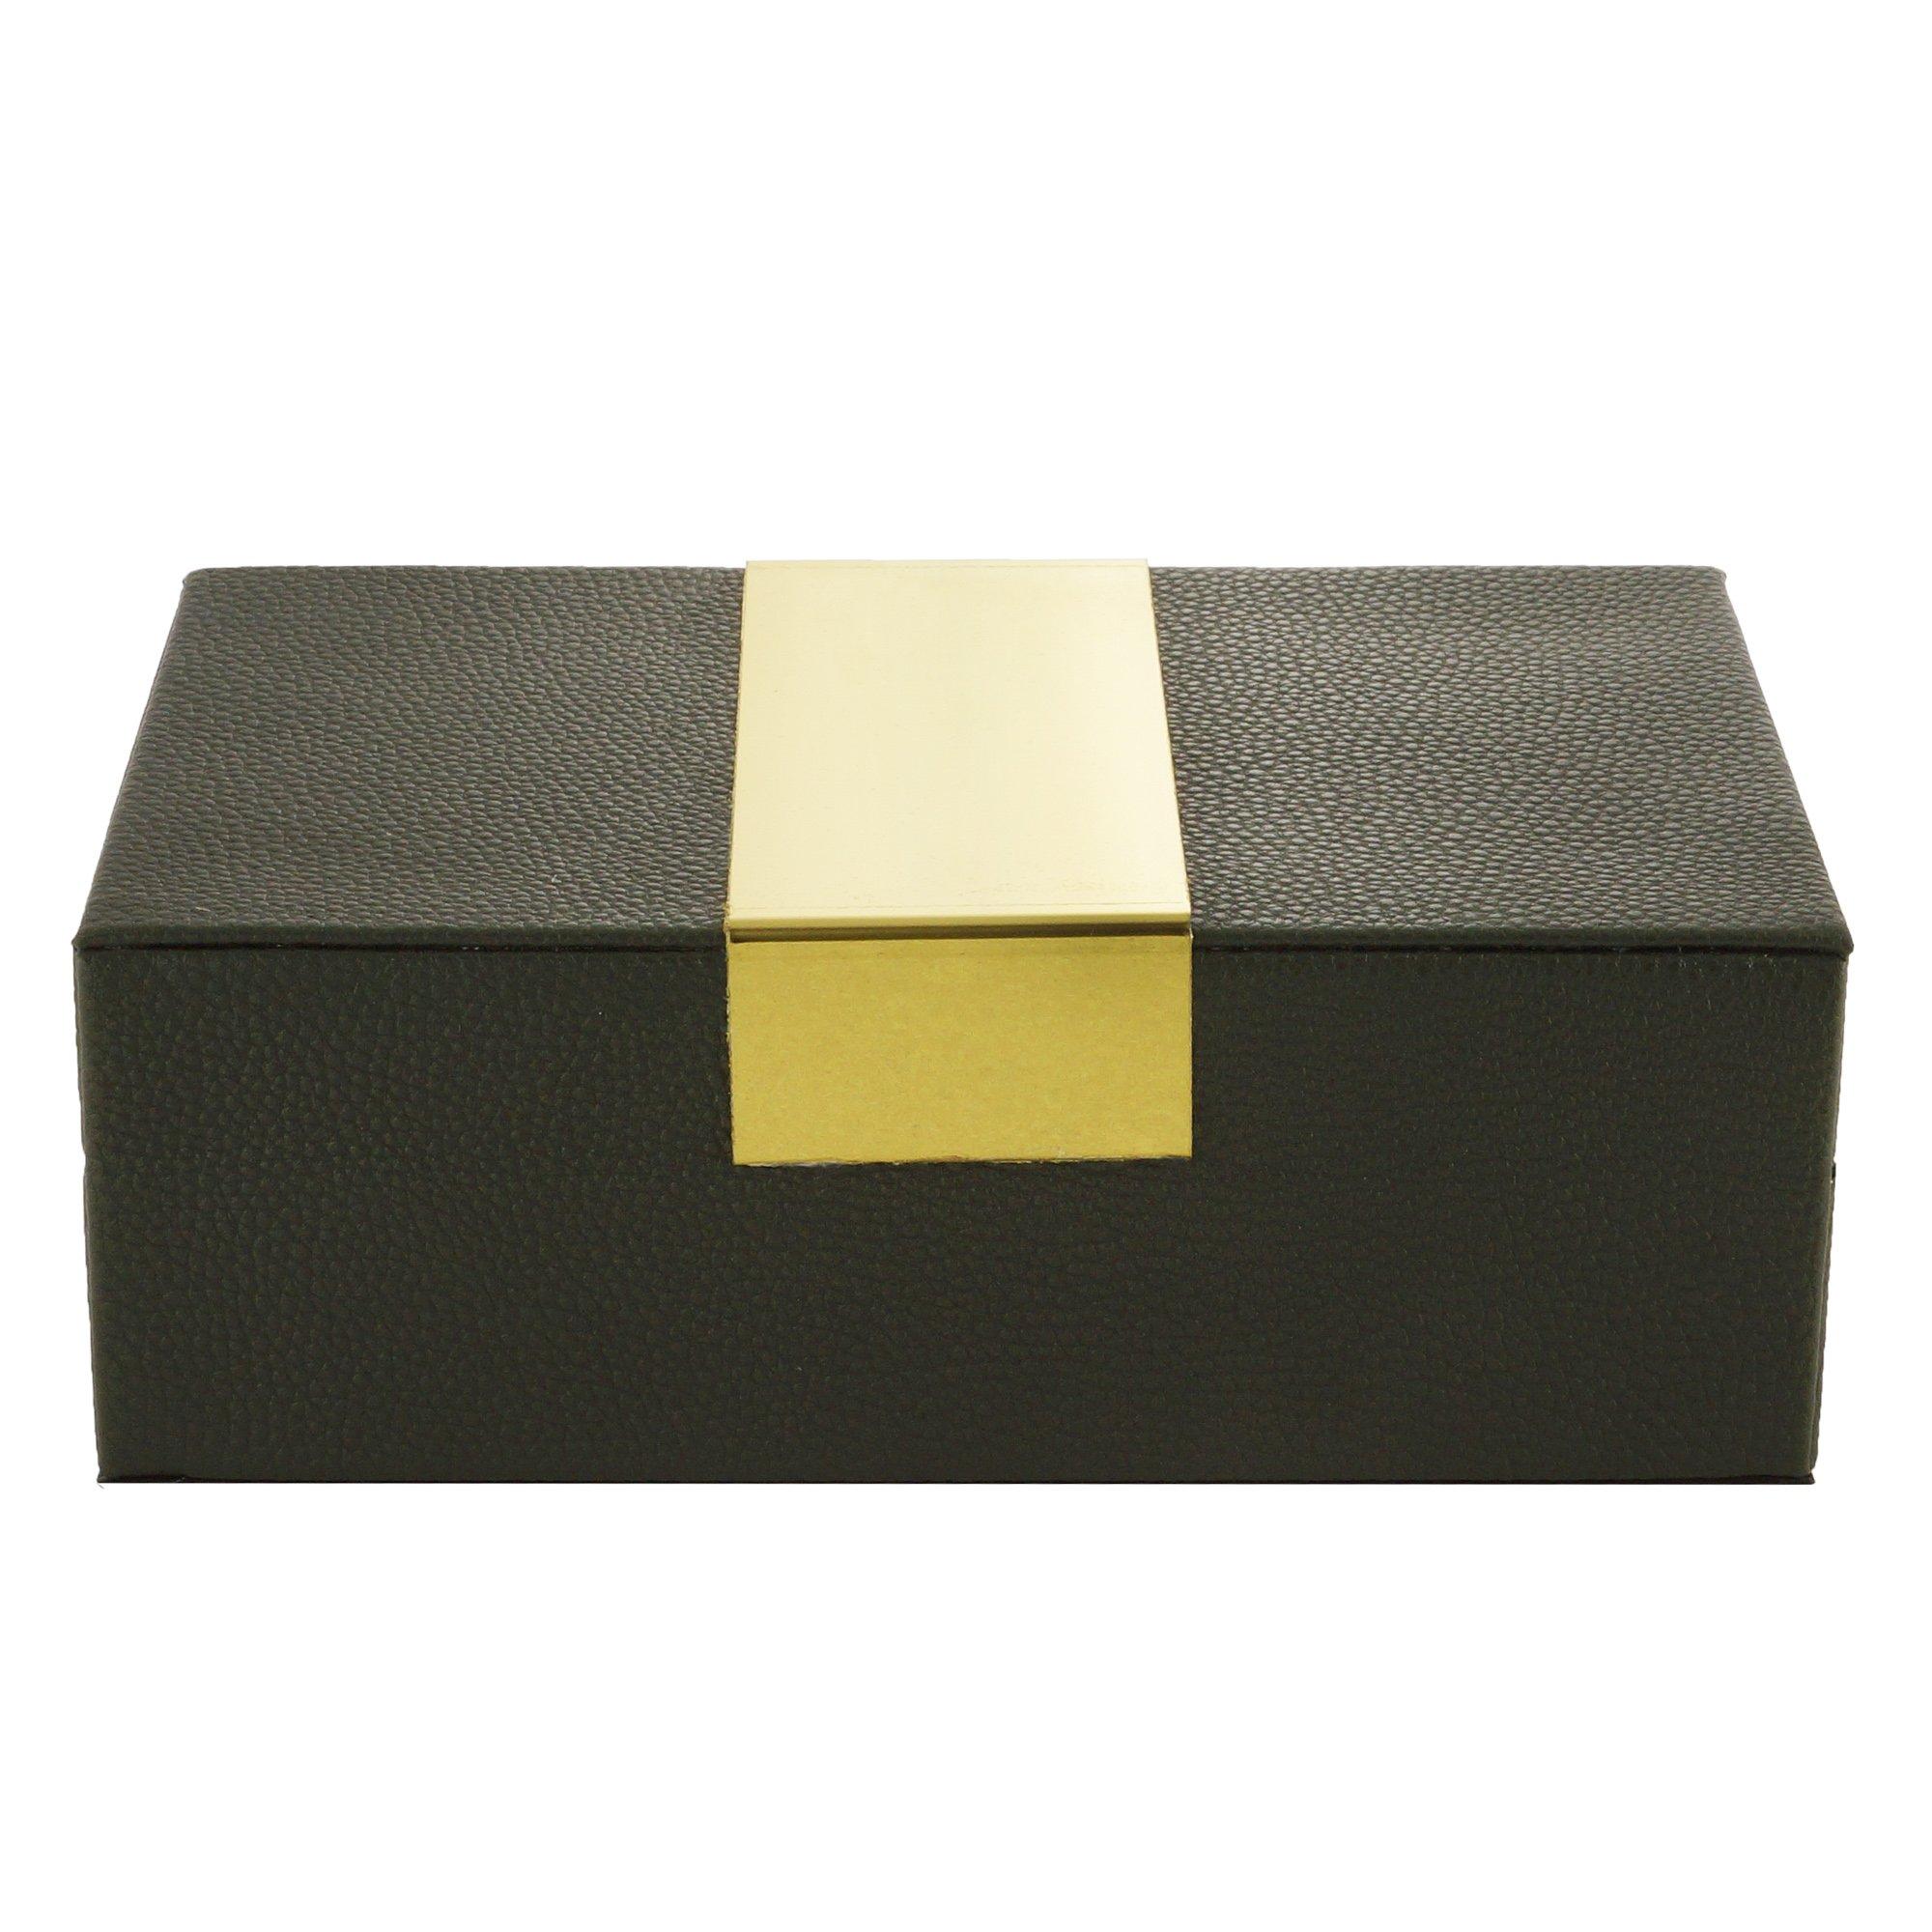 Caixa Decorativa De Corino Verde Escuro